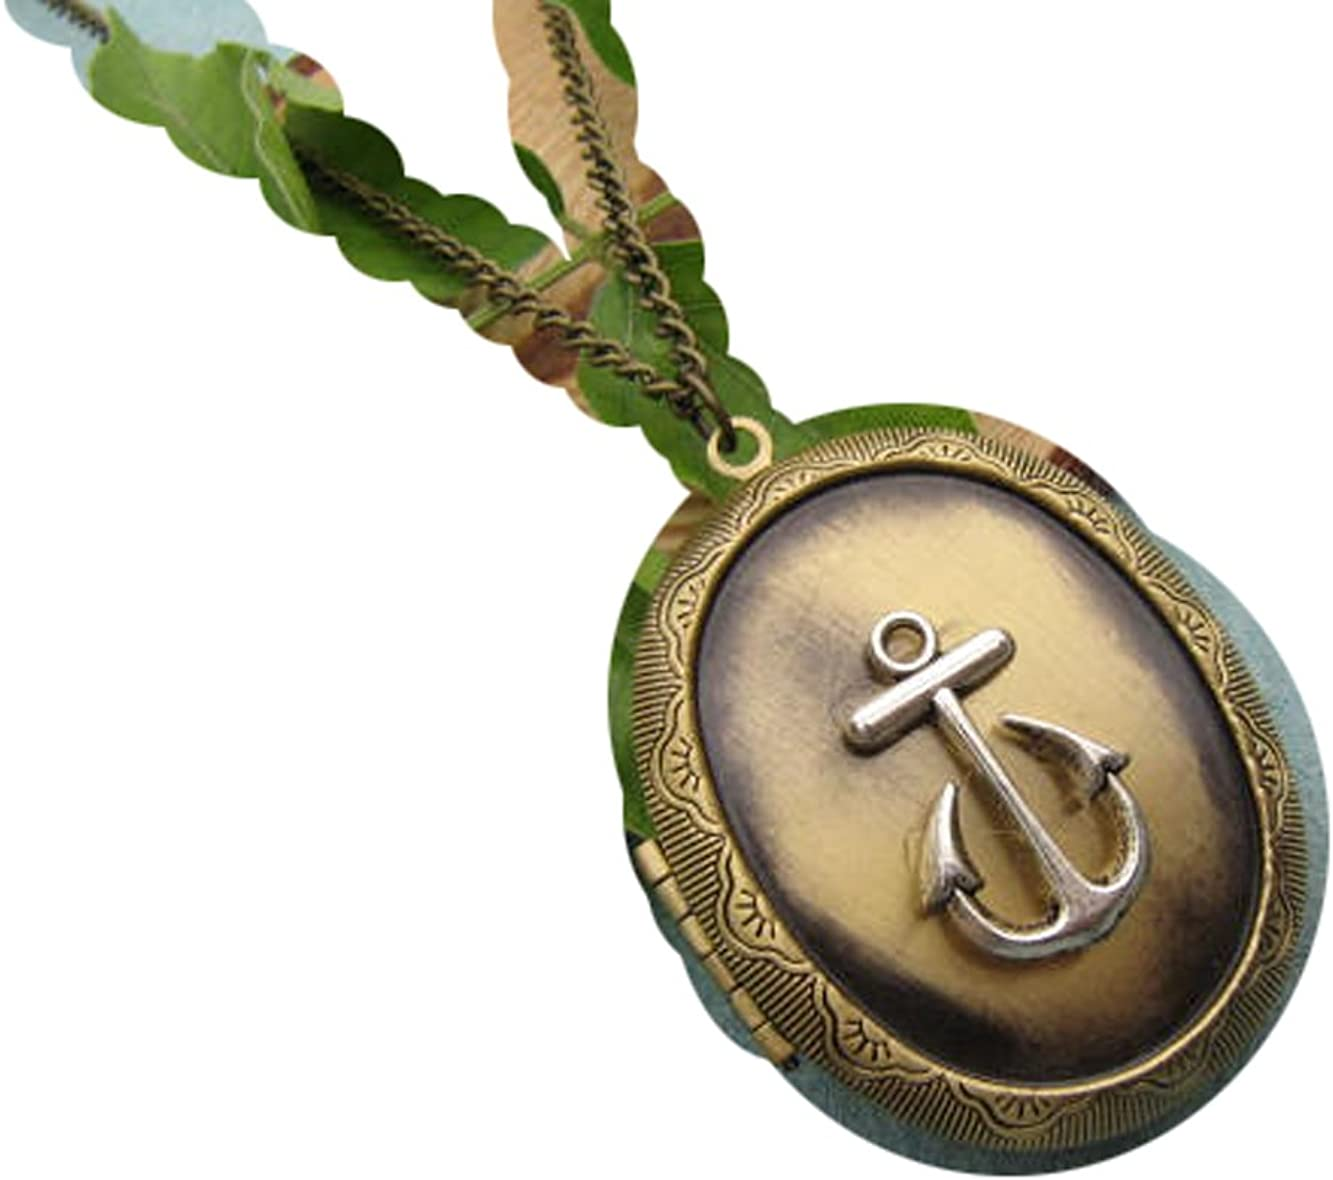 Sail Away,Anchor Locket,Luck,Nautical Necklace,Bronze Locket Necklace, Locket,Anchor,Ocean Locket